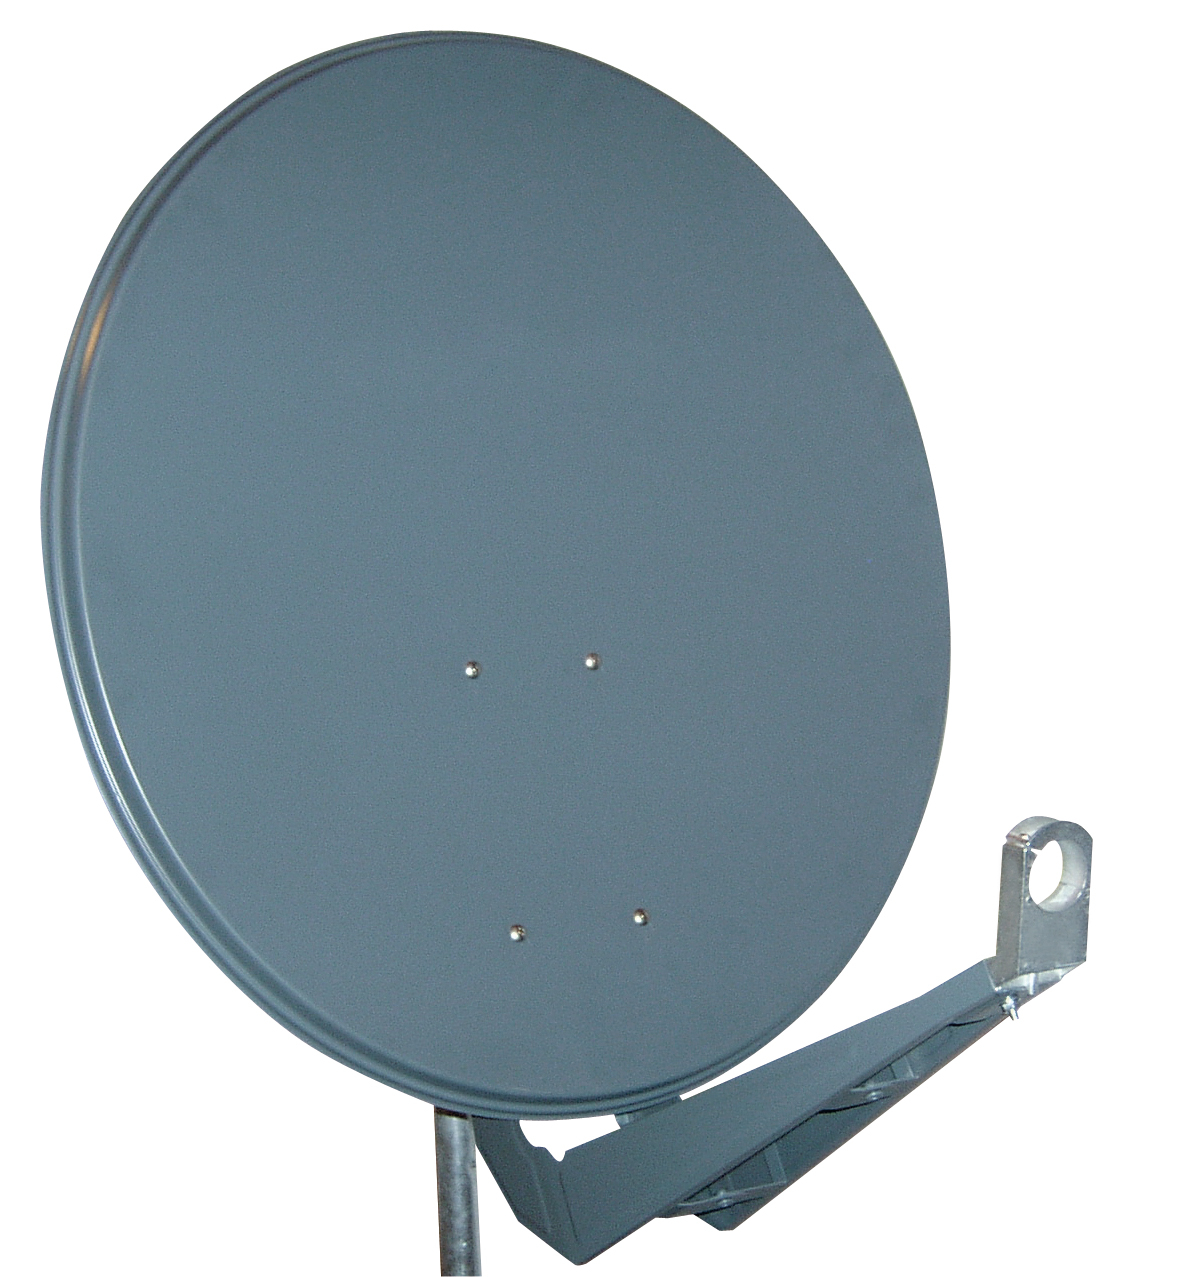 1 Stk SAT Antenne 100/95cm,Alu,>40dB Gain,Doppel Monoblok Arm,Anth HSATA100AA